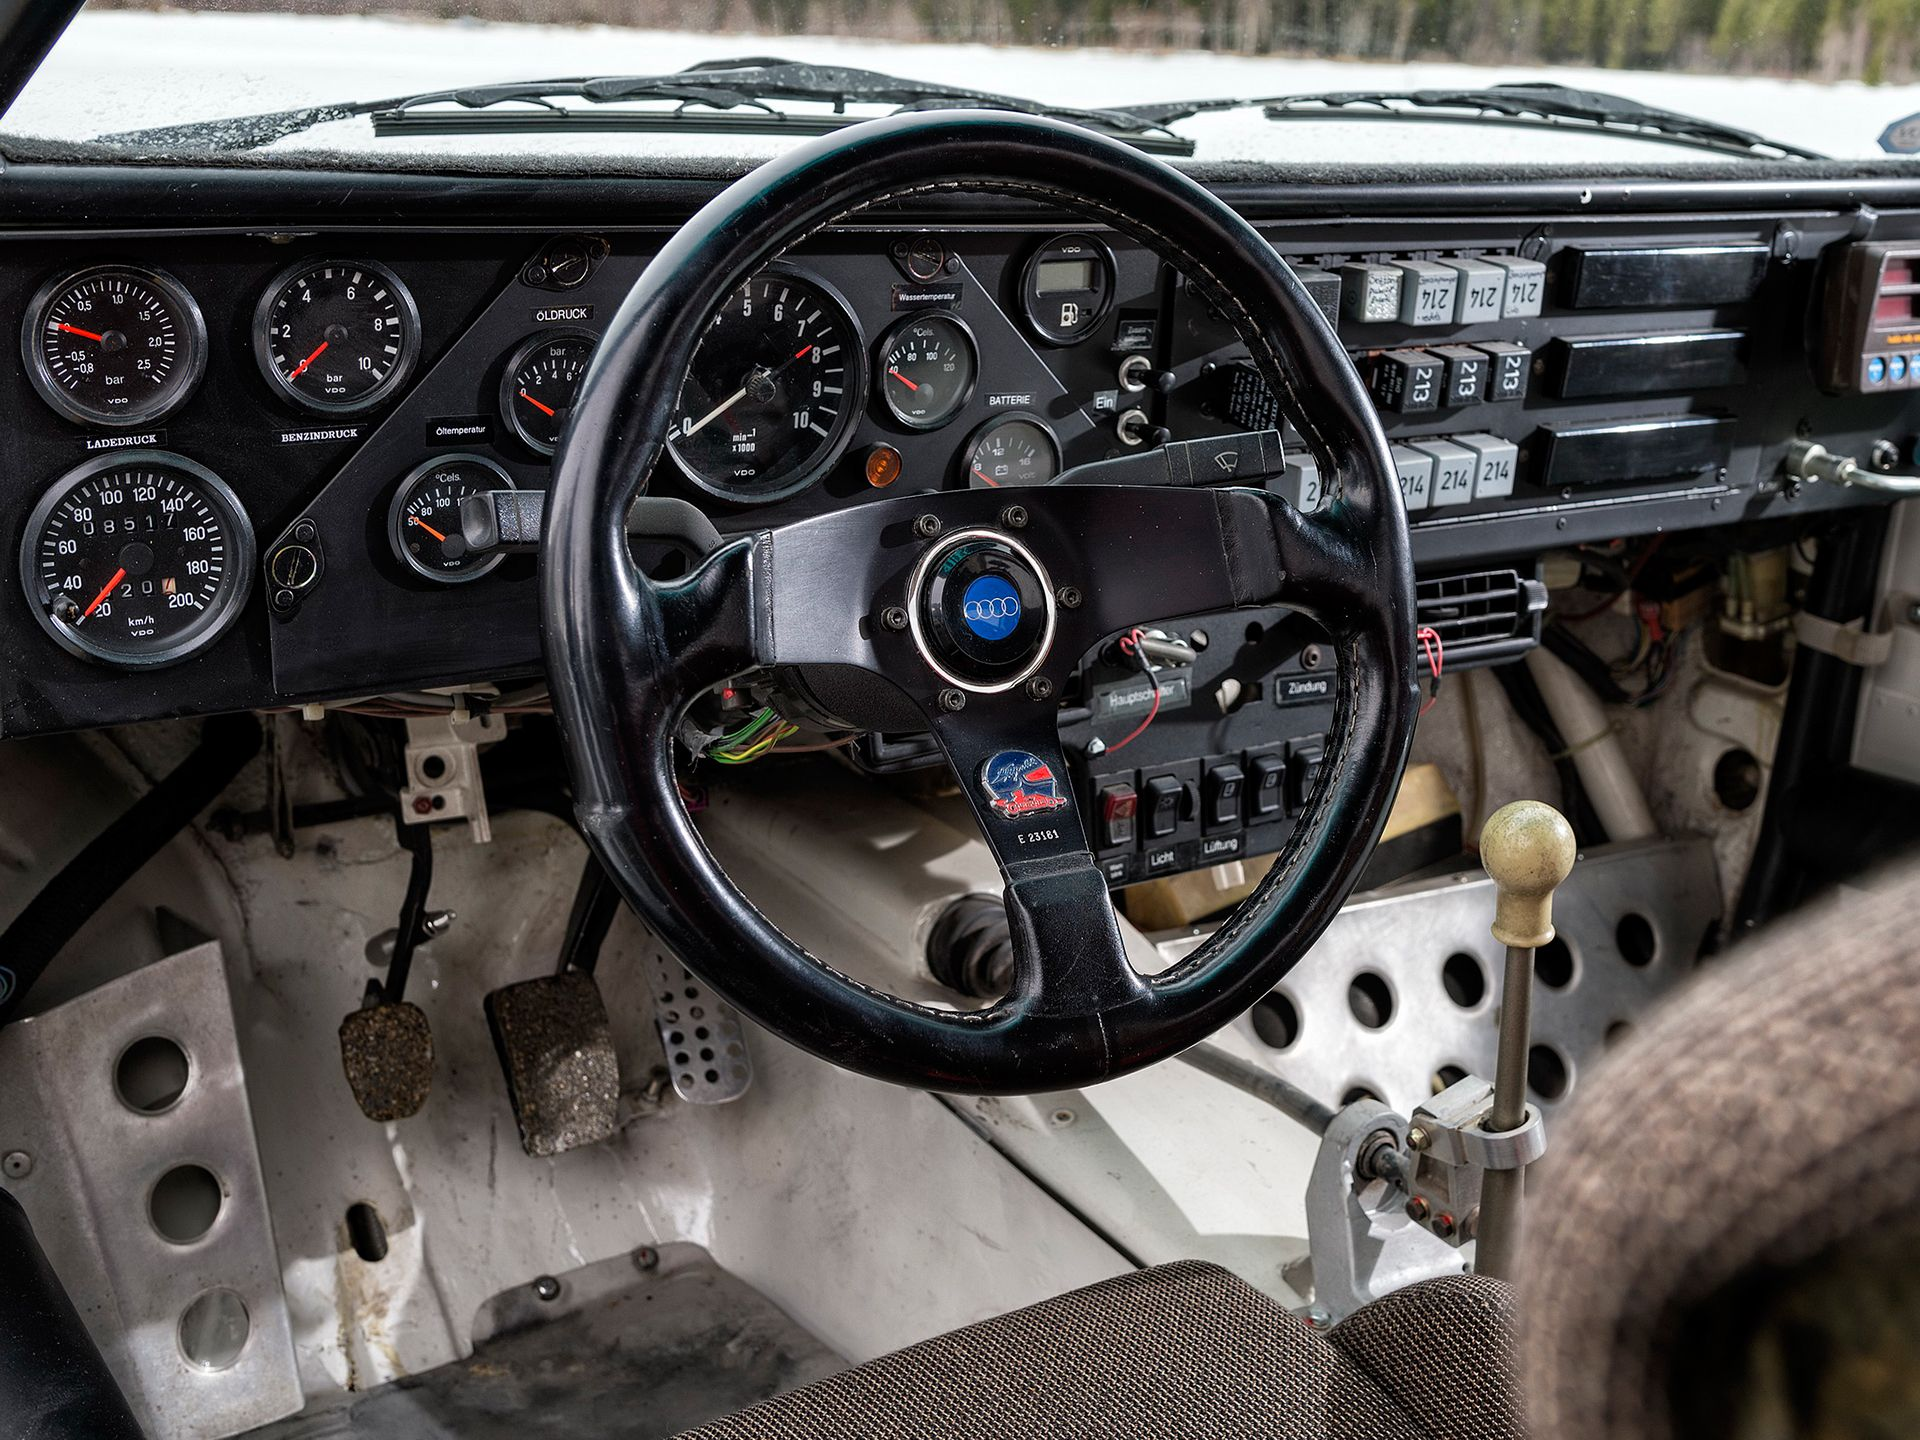 audi sport quattro s1 fia group b rally car 1985. Black Bedroom Furniture Sets. Home Design Ideas